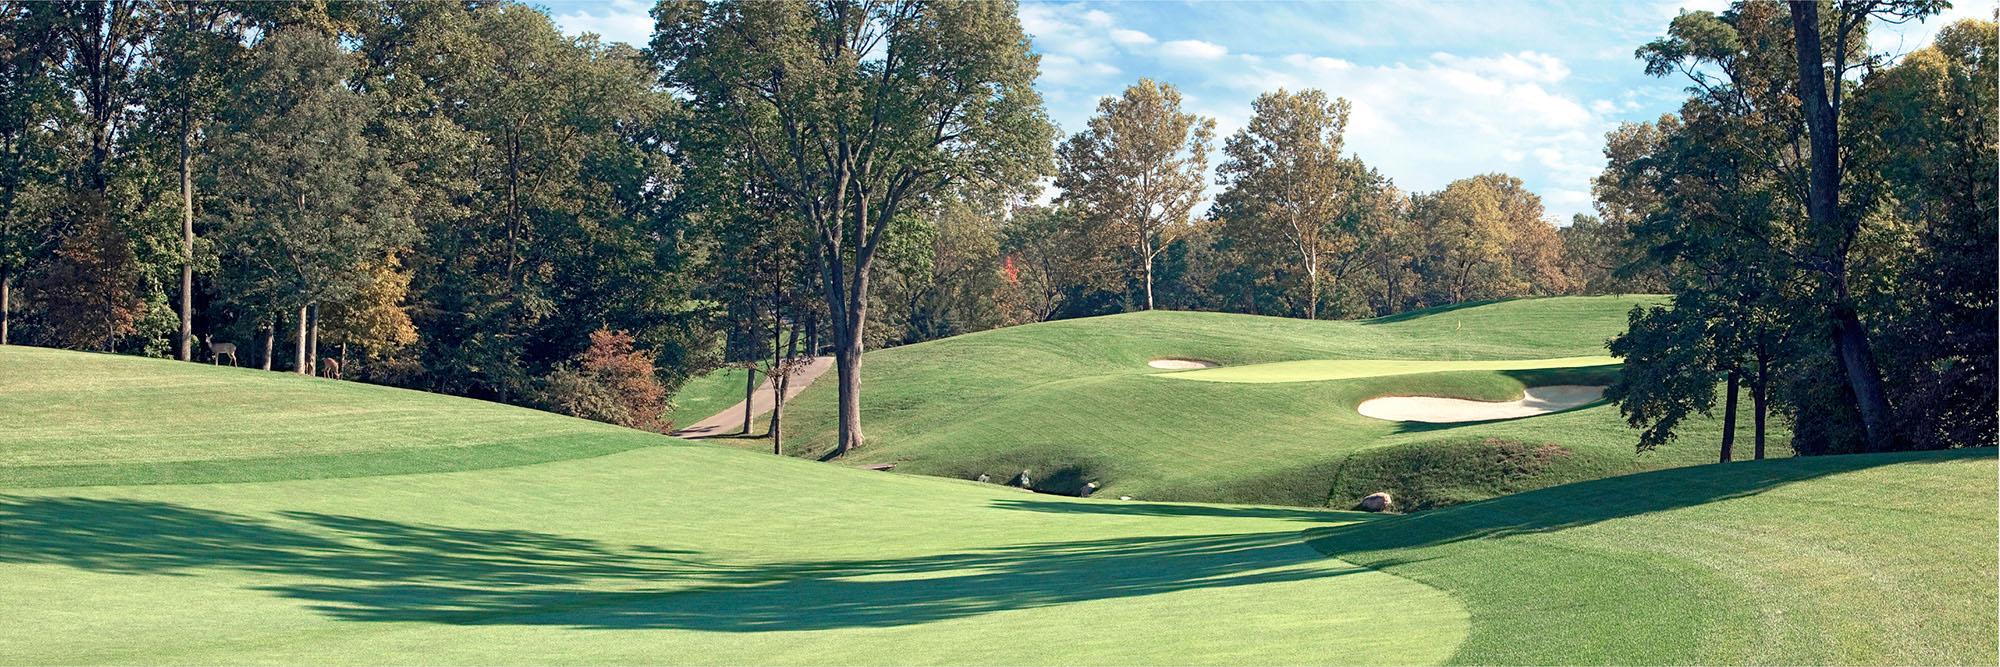 Golf Course Image - Muirfield Village No. 17